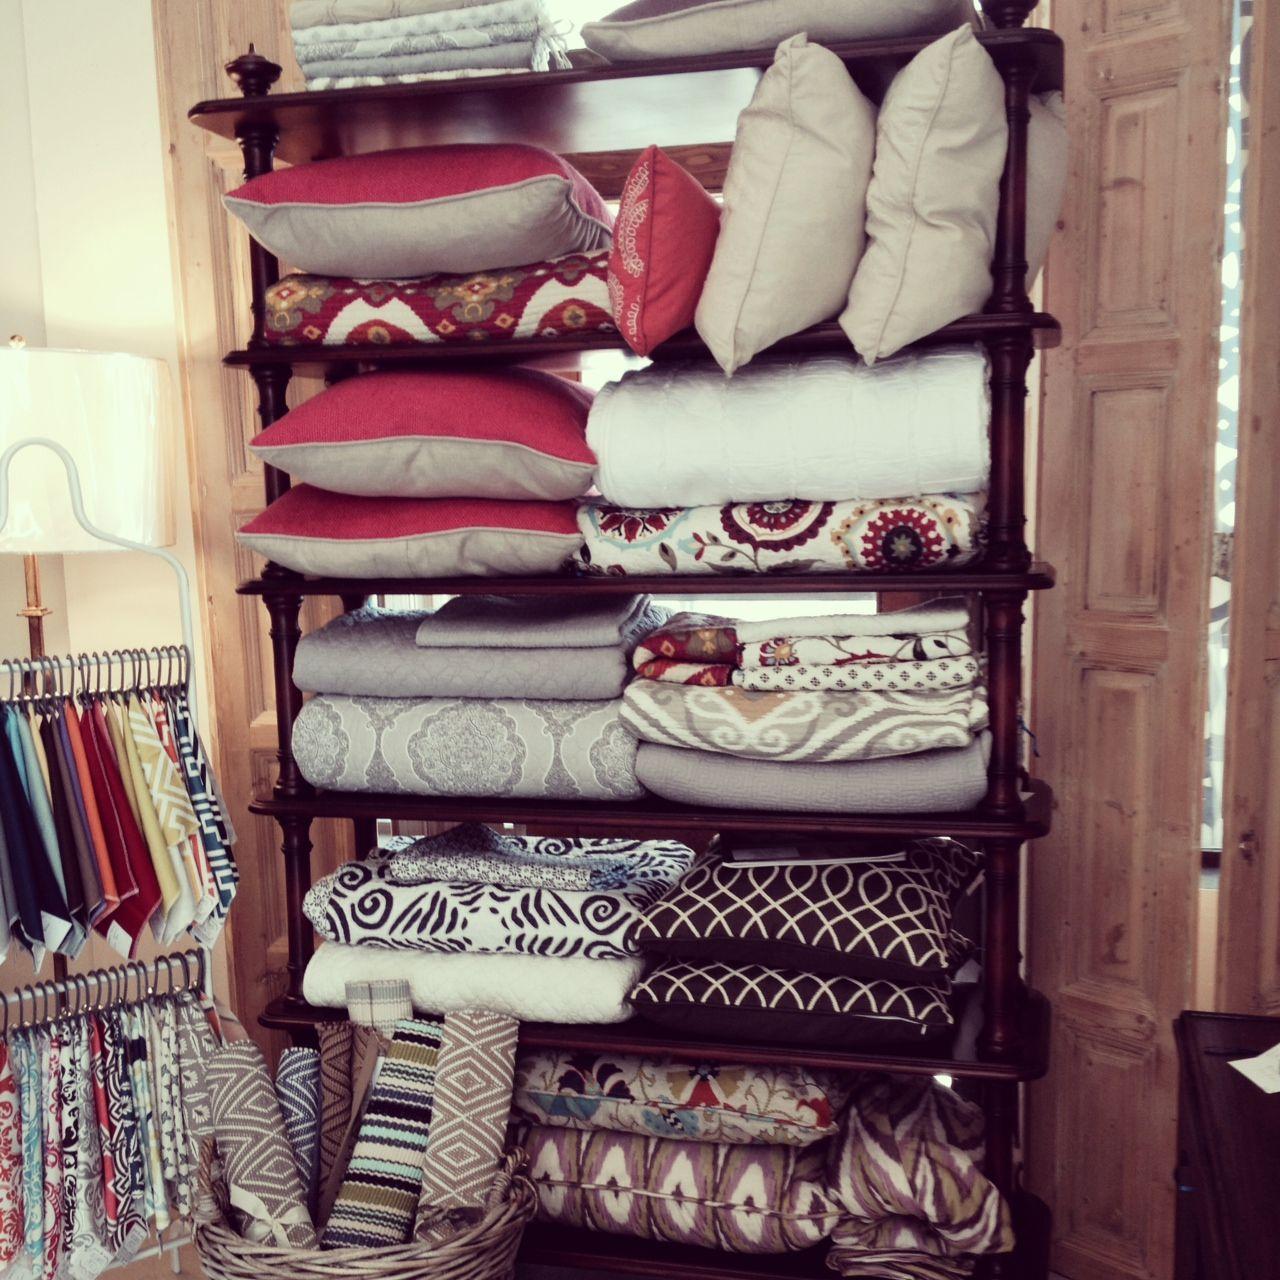 Laura Ramsey Furniture U0026 Interiors } New Bedding Display.  #lauraramseyinteriors #home #decor